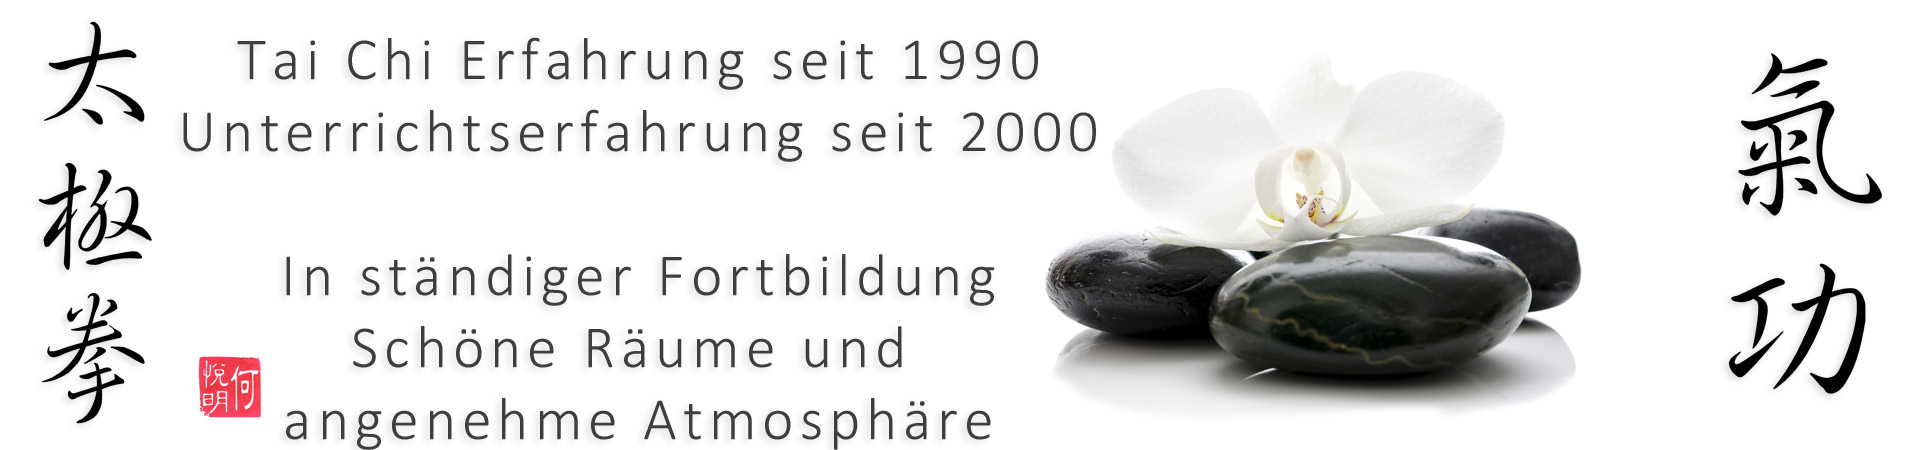 Bernd_Haber_Tai-Chi_Qi-Gong_slide01-01